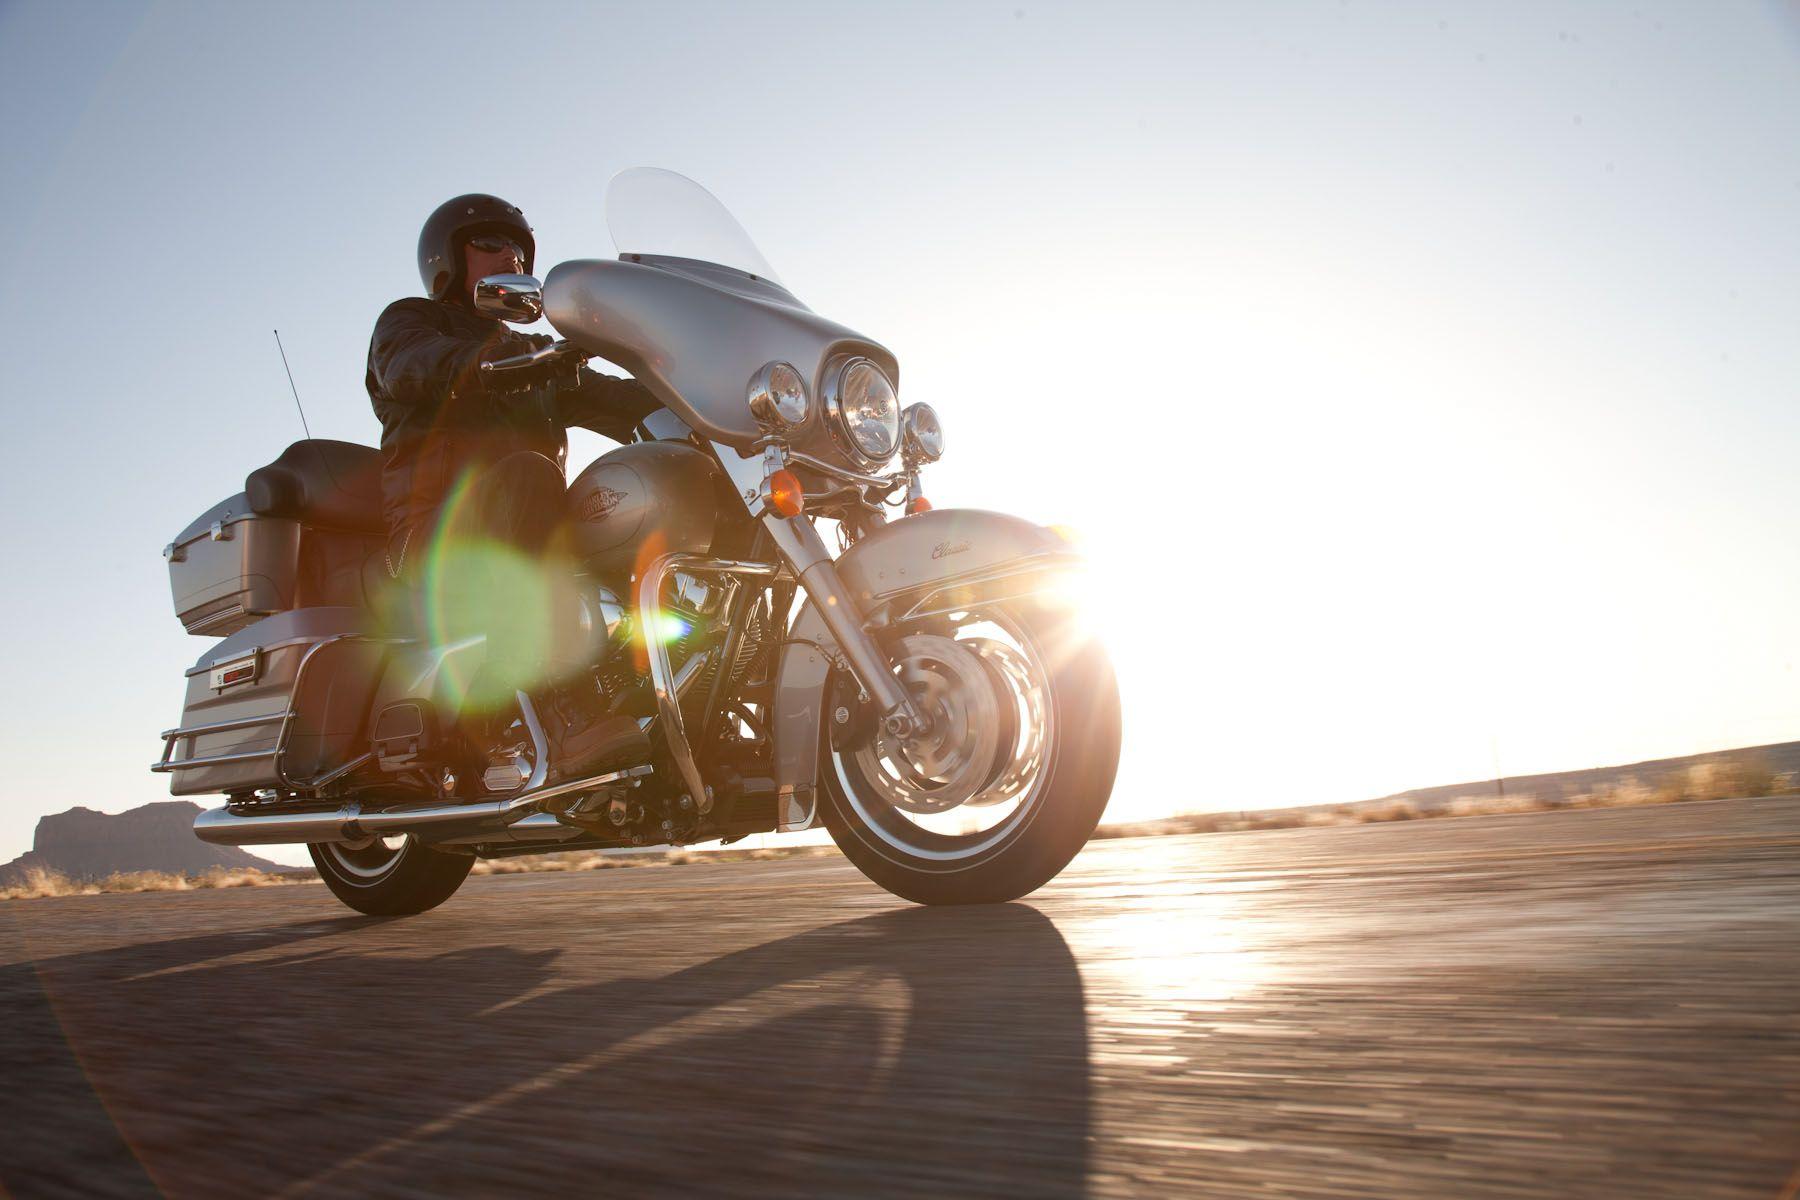 Harley Davidson Riding Into The Sunset Harley Davidson Harley